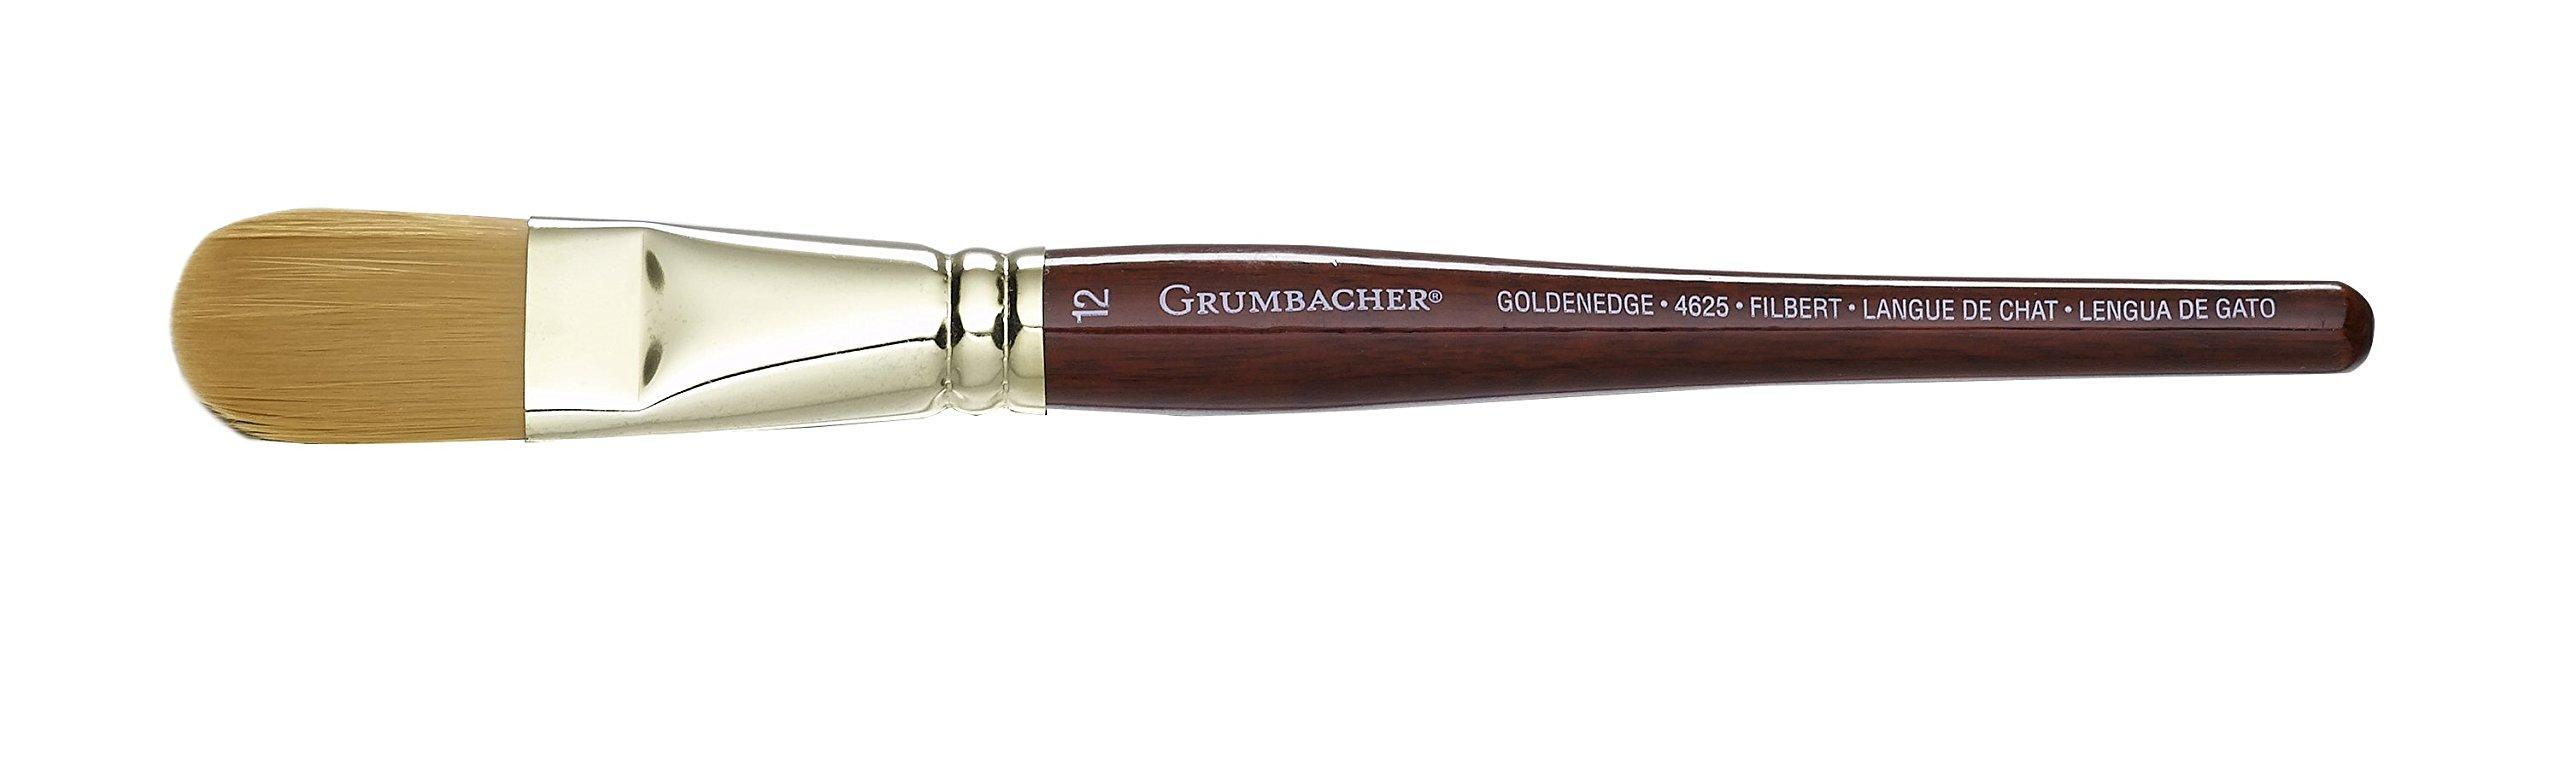 Grumbacher Goldenedge Golden Toray Filbert Watercolor Brush, Synthetic Bristles, Size 12 (4625.12)